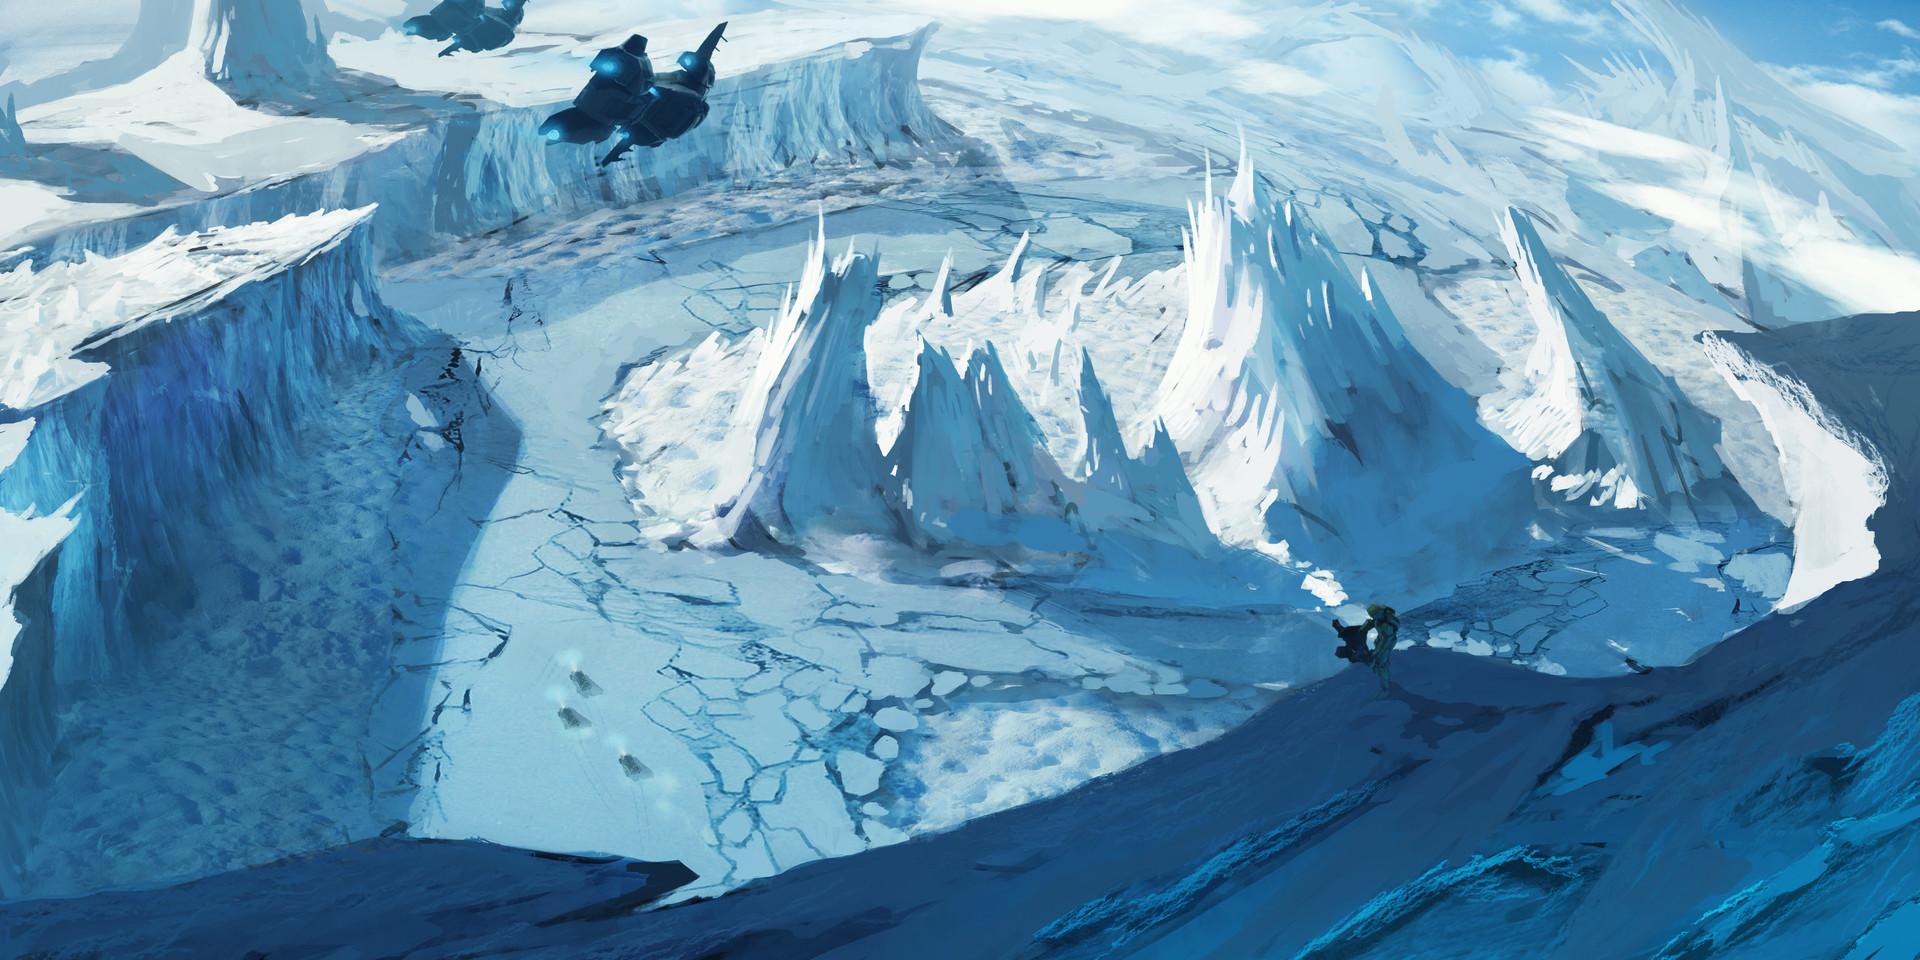 Brx wright refugia sketches ice ice